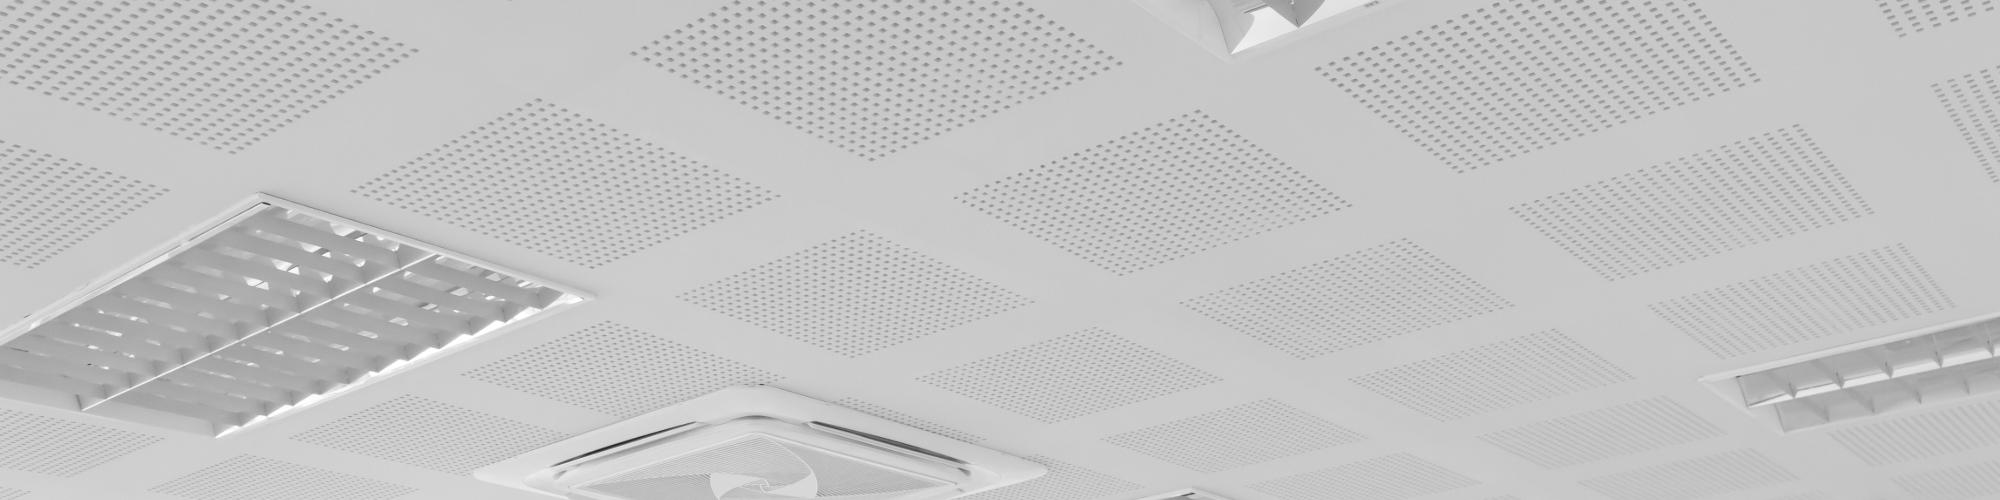 cafeteria ceiling